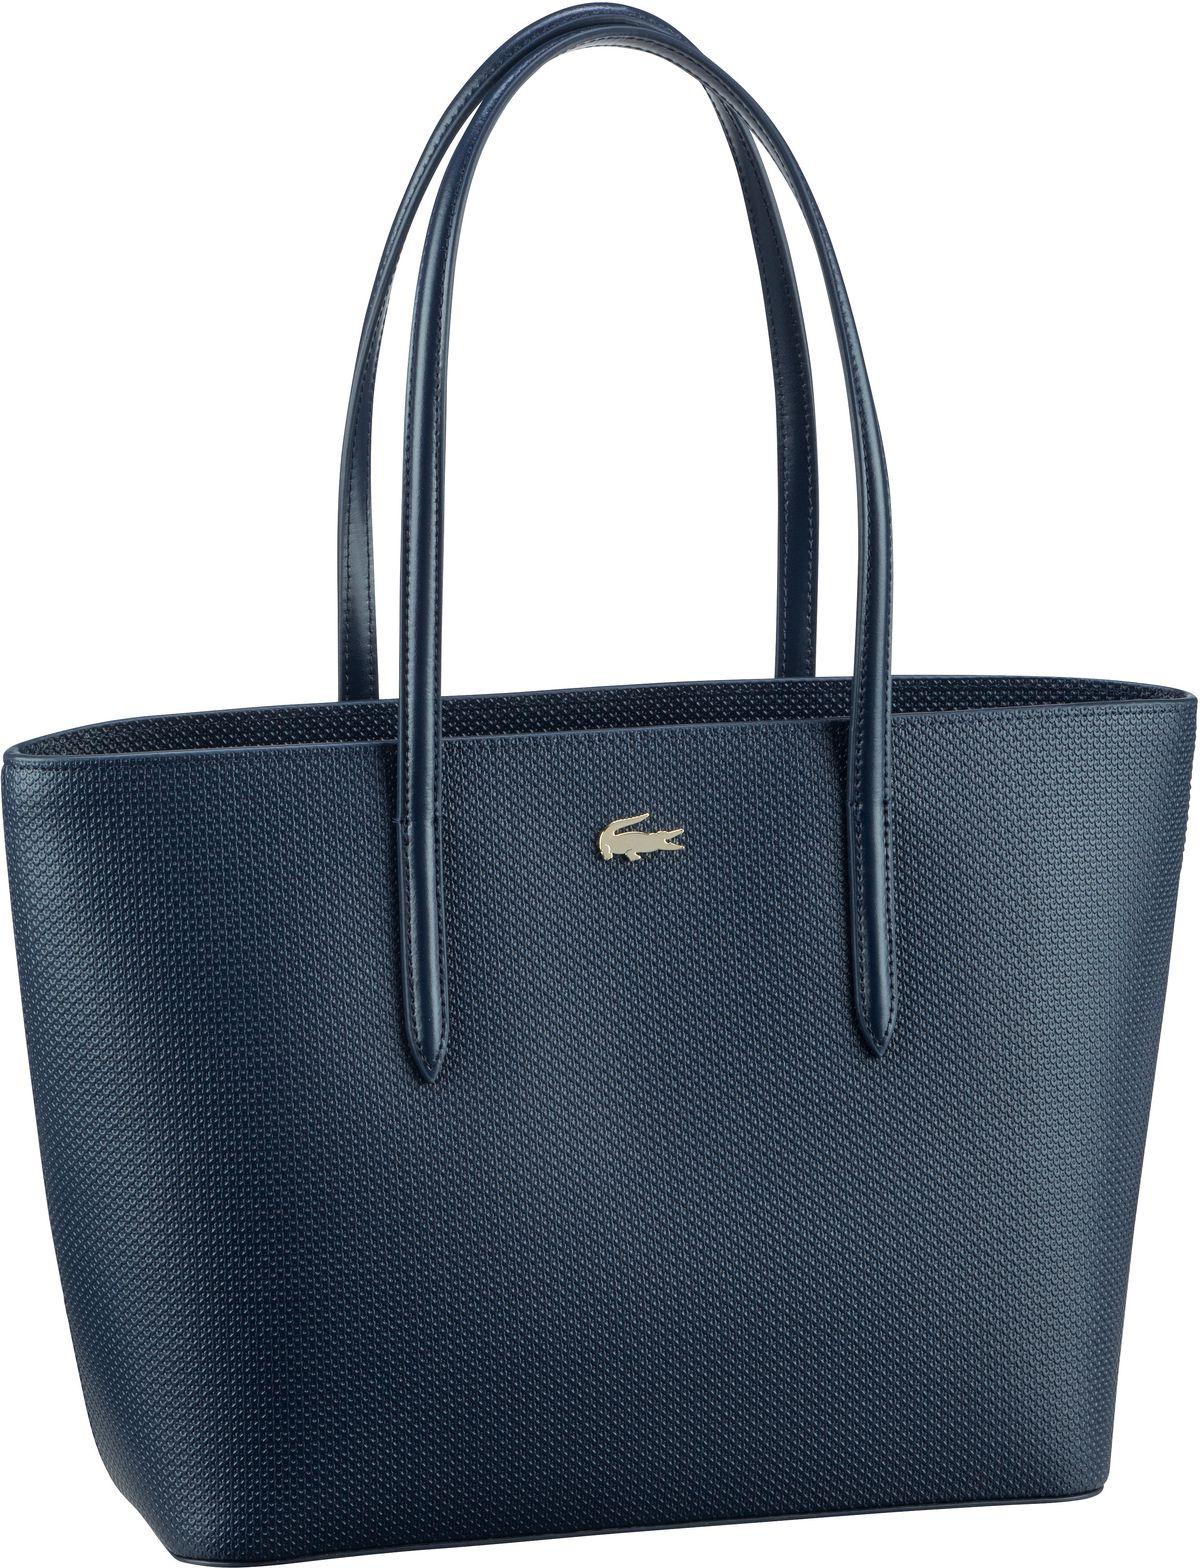 Handtasche Chantaco Shopping Bag 2733 Peacoat